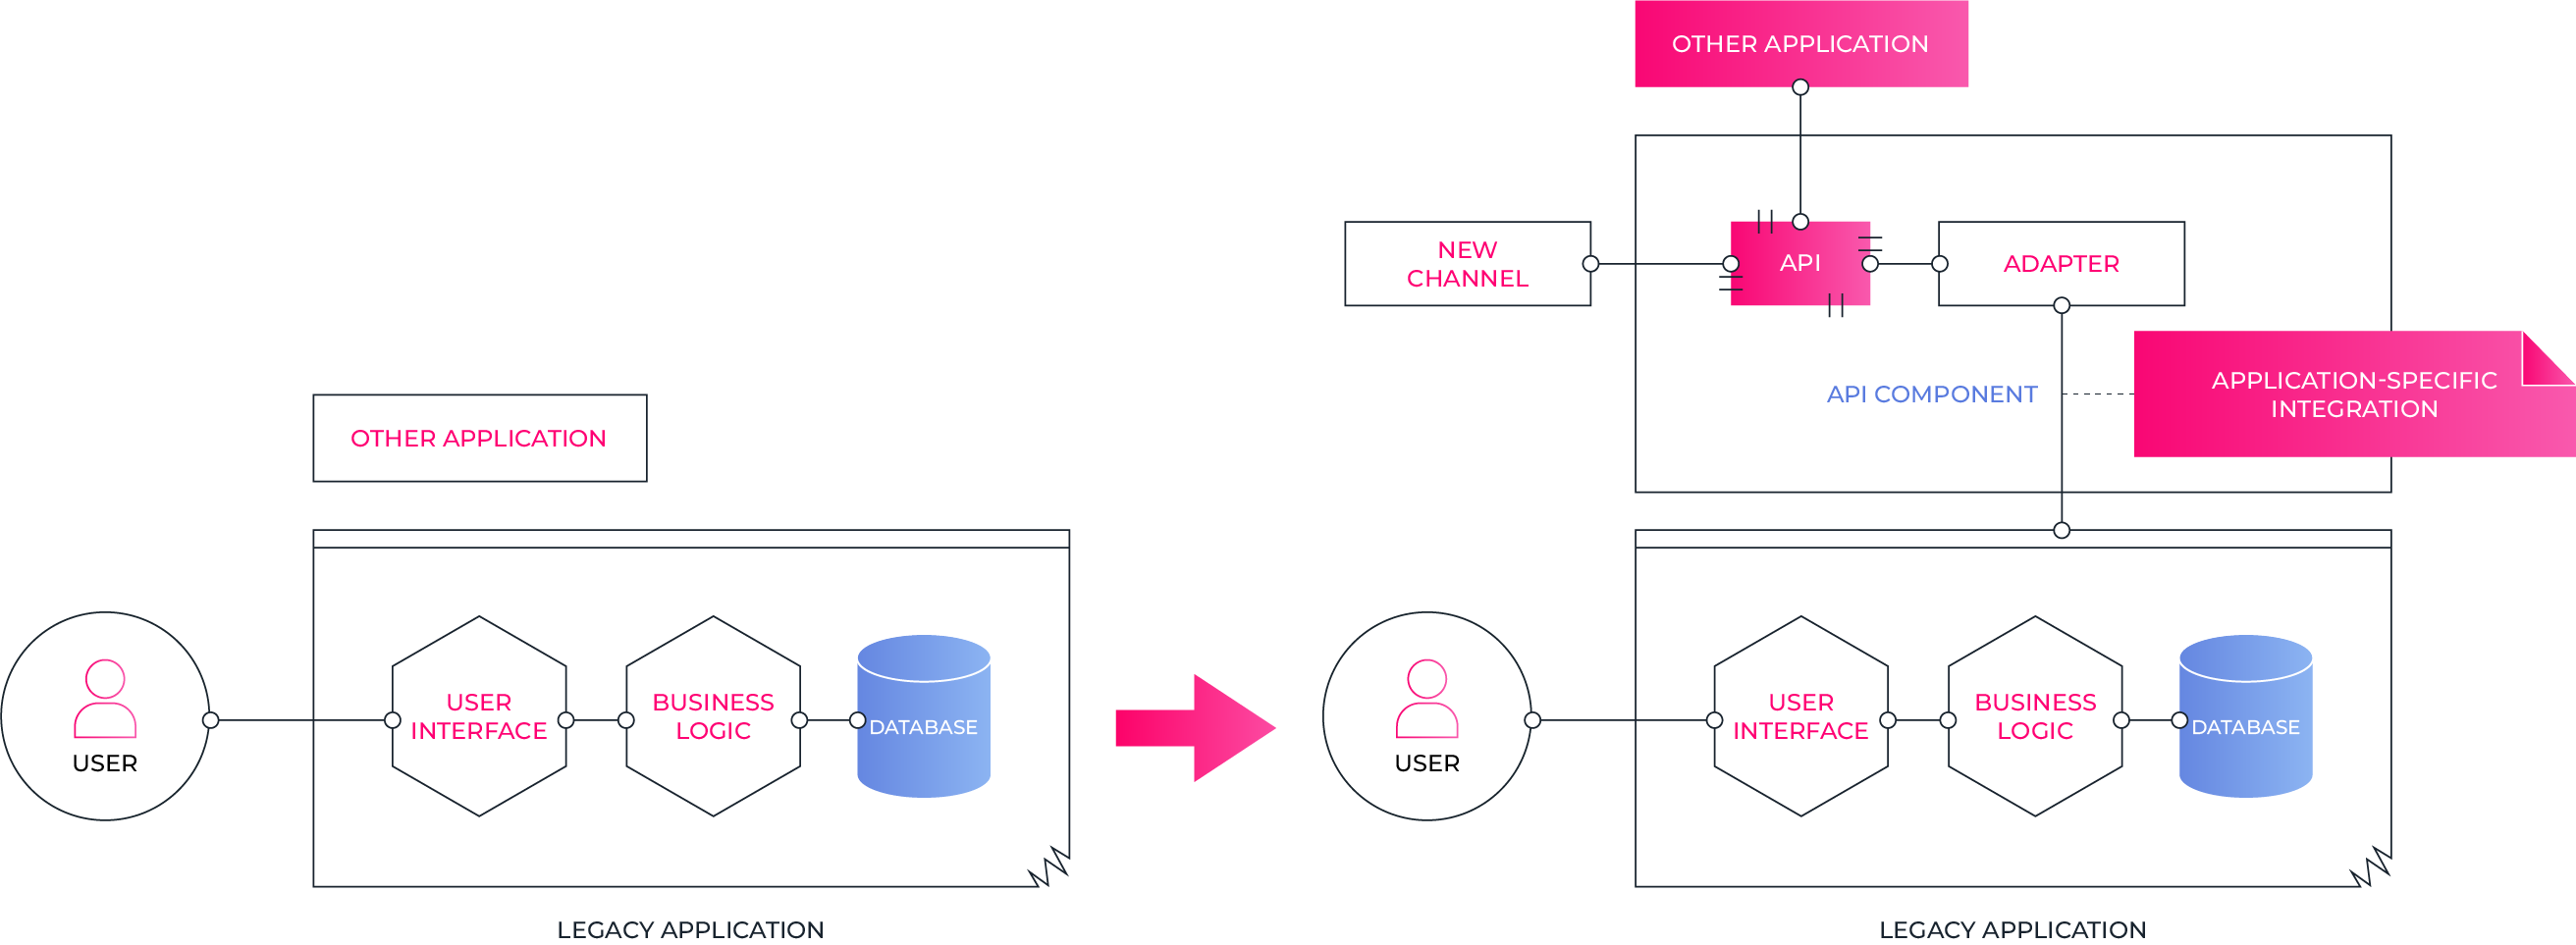 schema_legacy-code-api-component